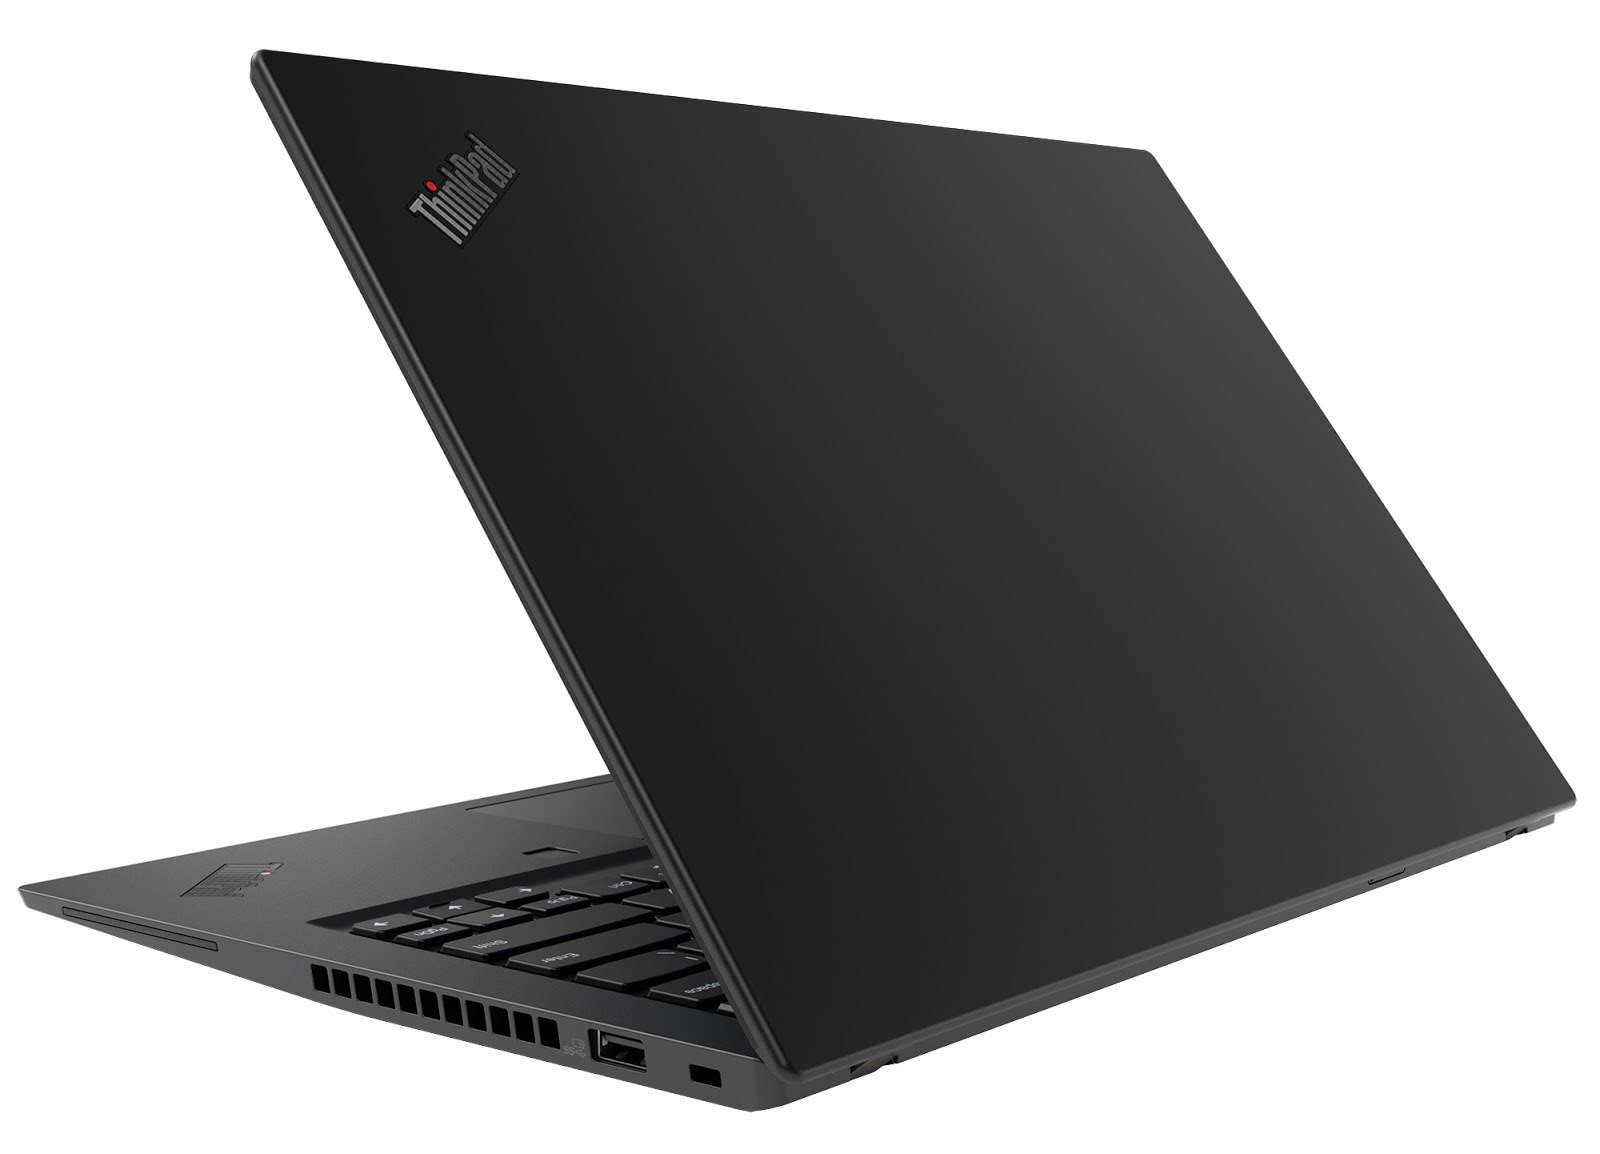 Фото 2. Ноутбук Lenovo ThinkPad T14 Gen 1 Black (20S0000MRT)